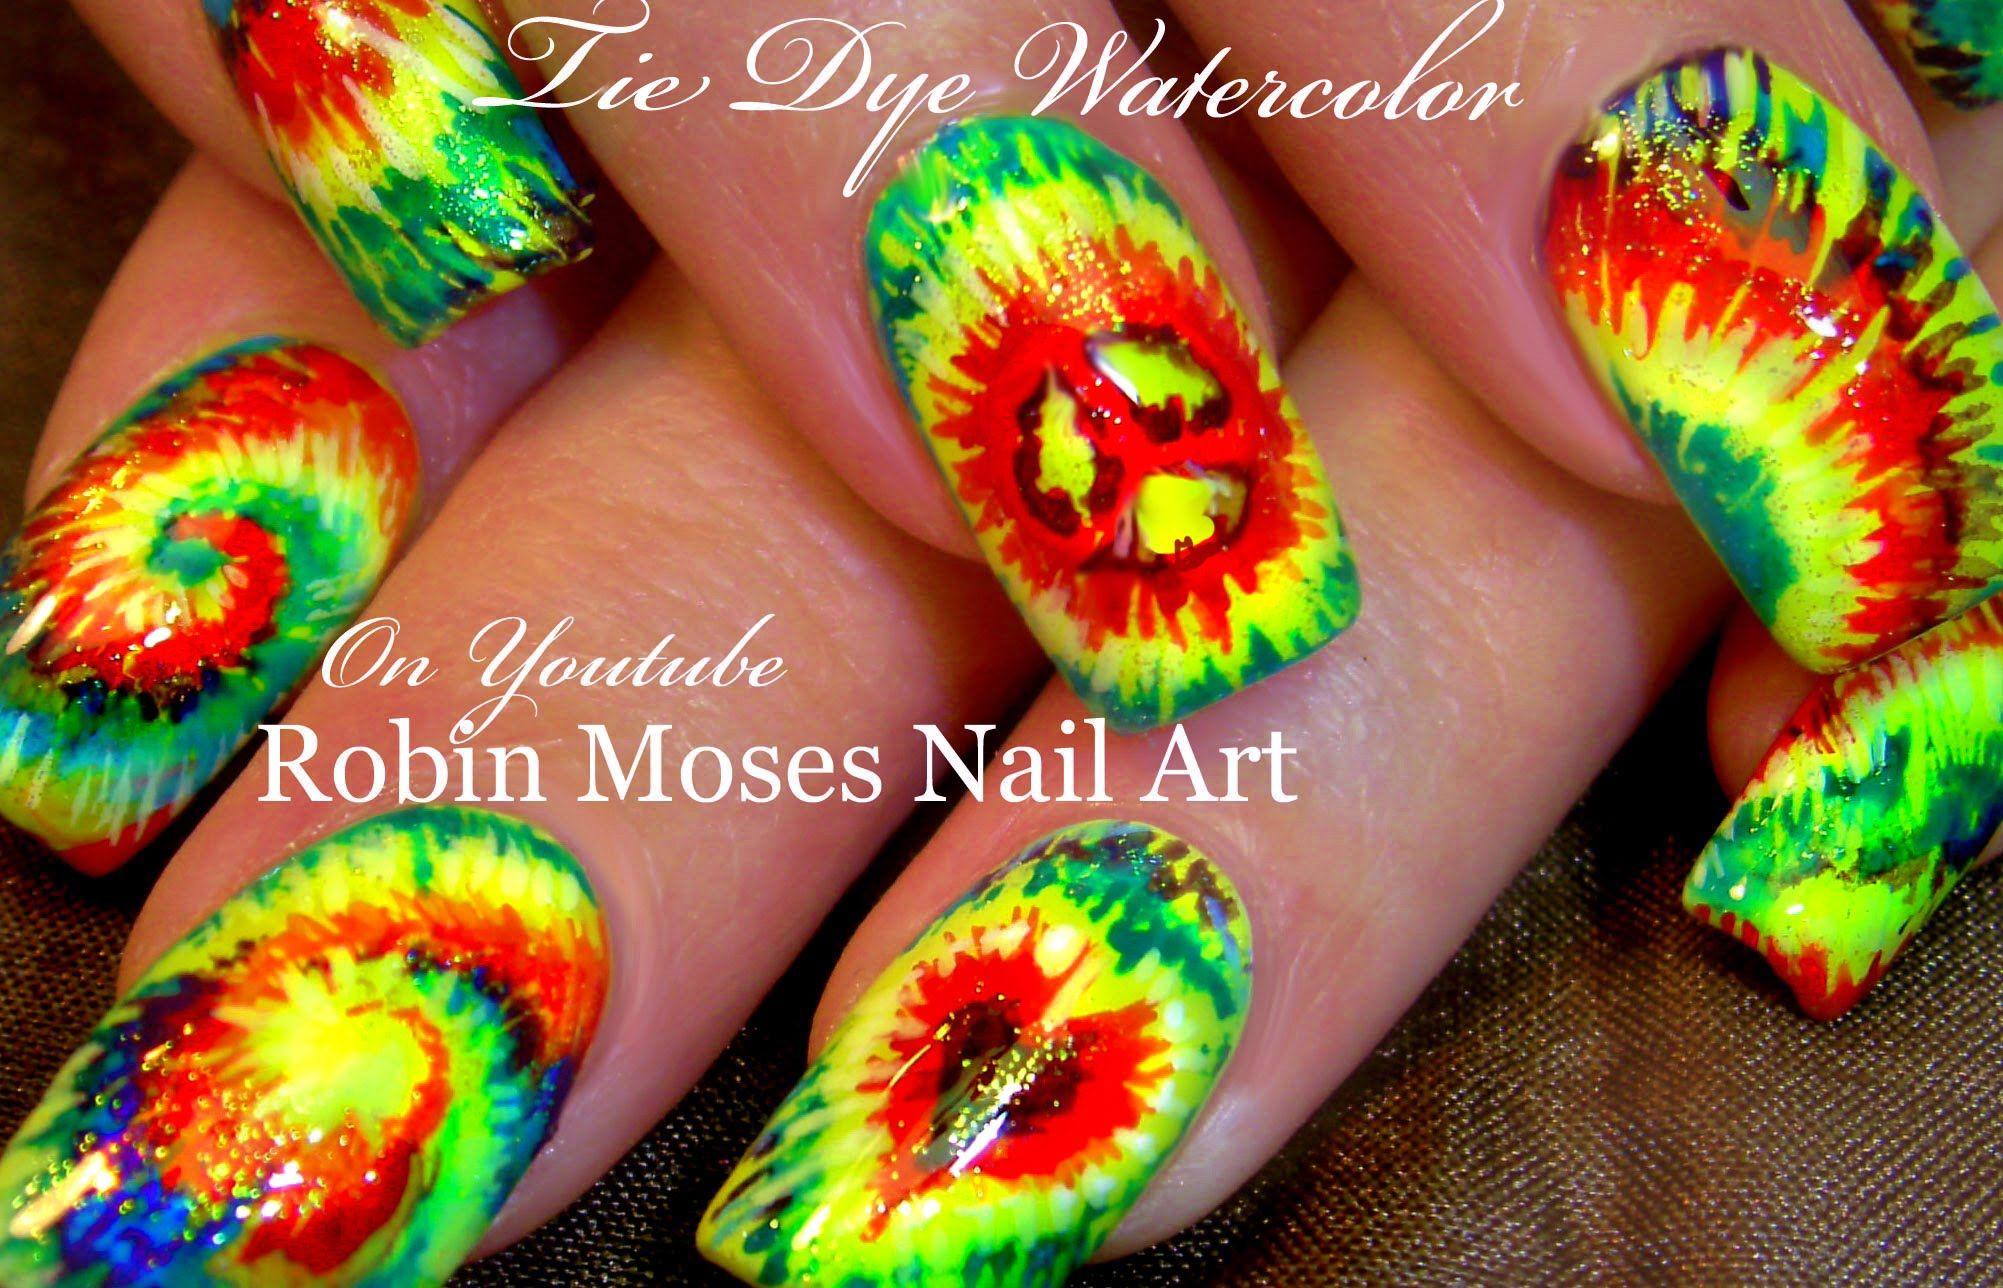 Diy Tie Dye Nails Hippie Rasta Watercolor Nail Art Design Tutorial